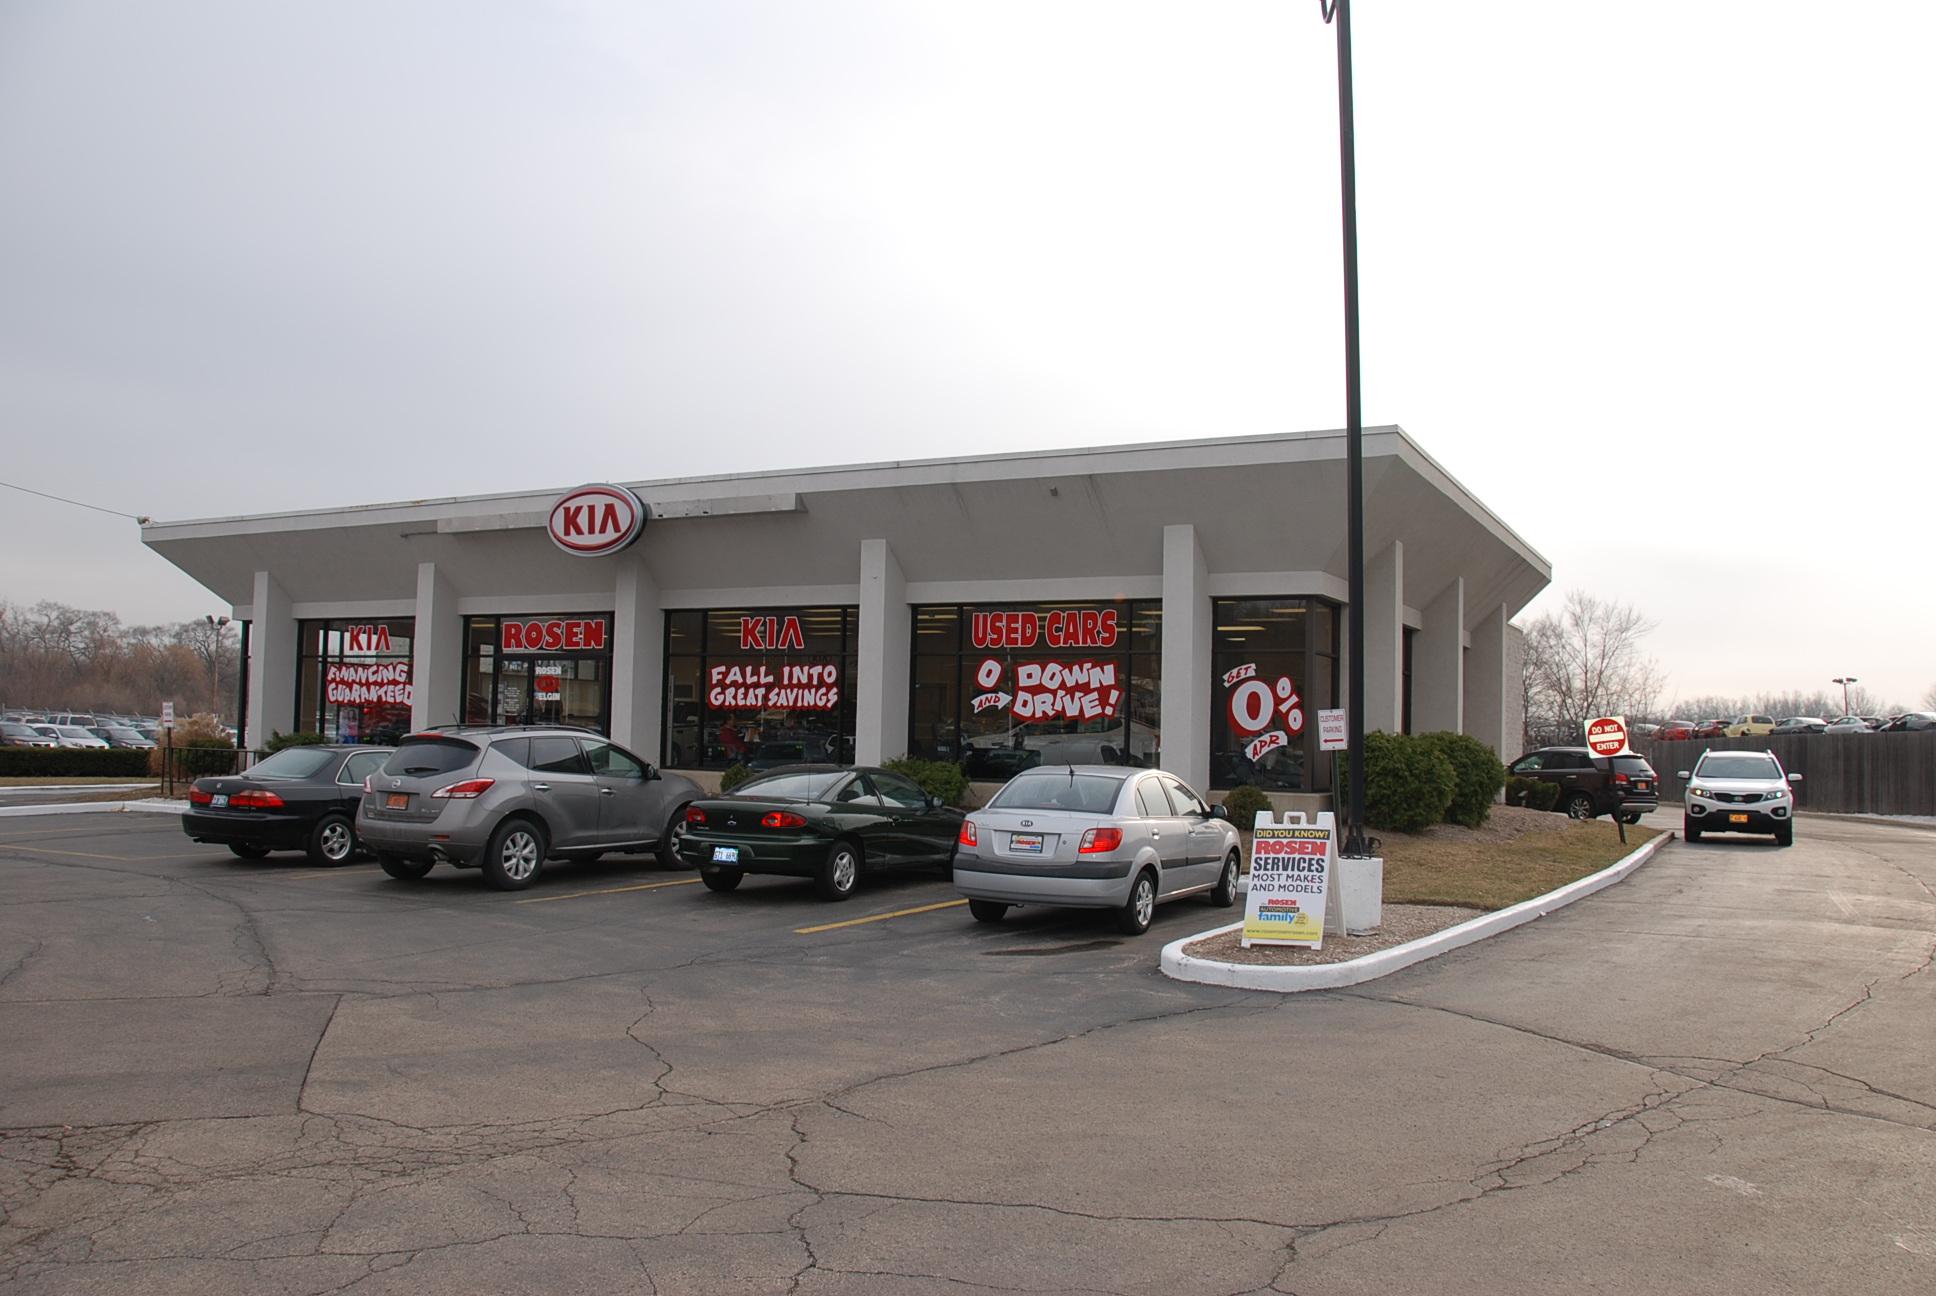 rosen kia of elgin 845 e chicago st elgin il auto dealers mapquest. Black Bedroom Furniture Sets. Home Design Ideas